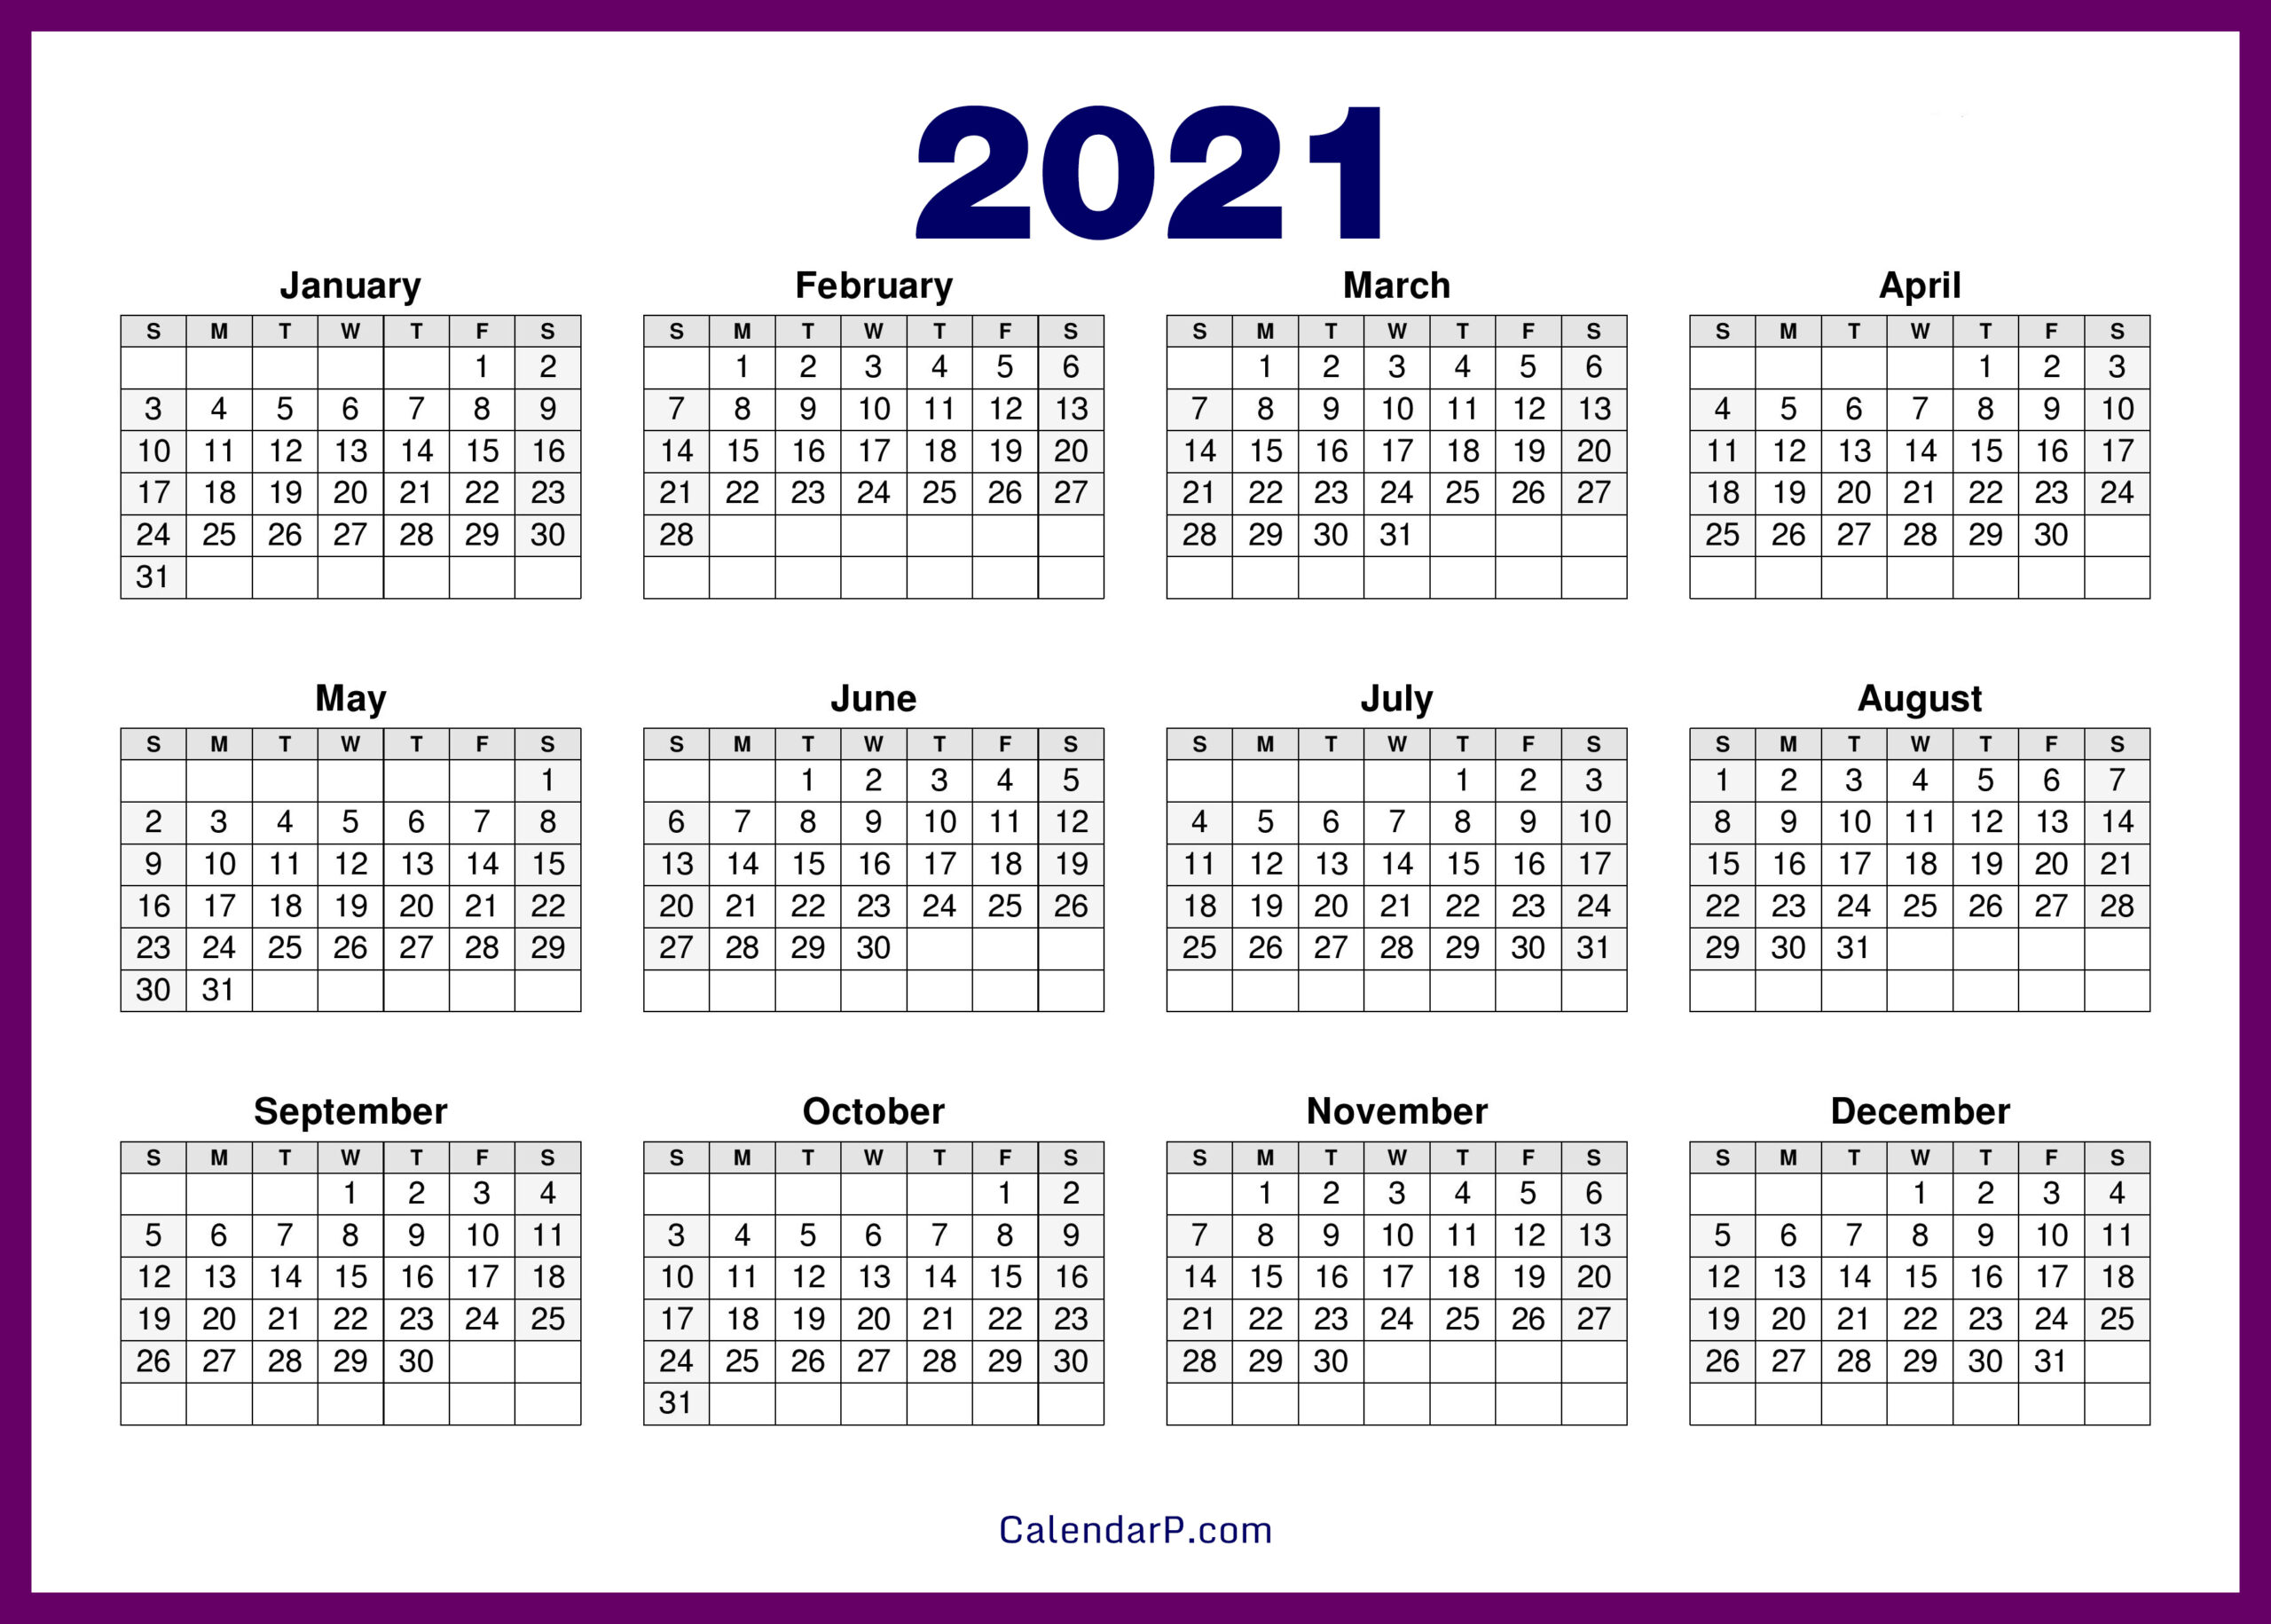 2021 Calendar Printable Free, Hd – Purple – Calendarp